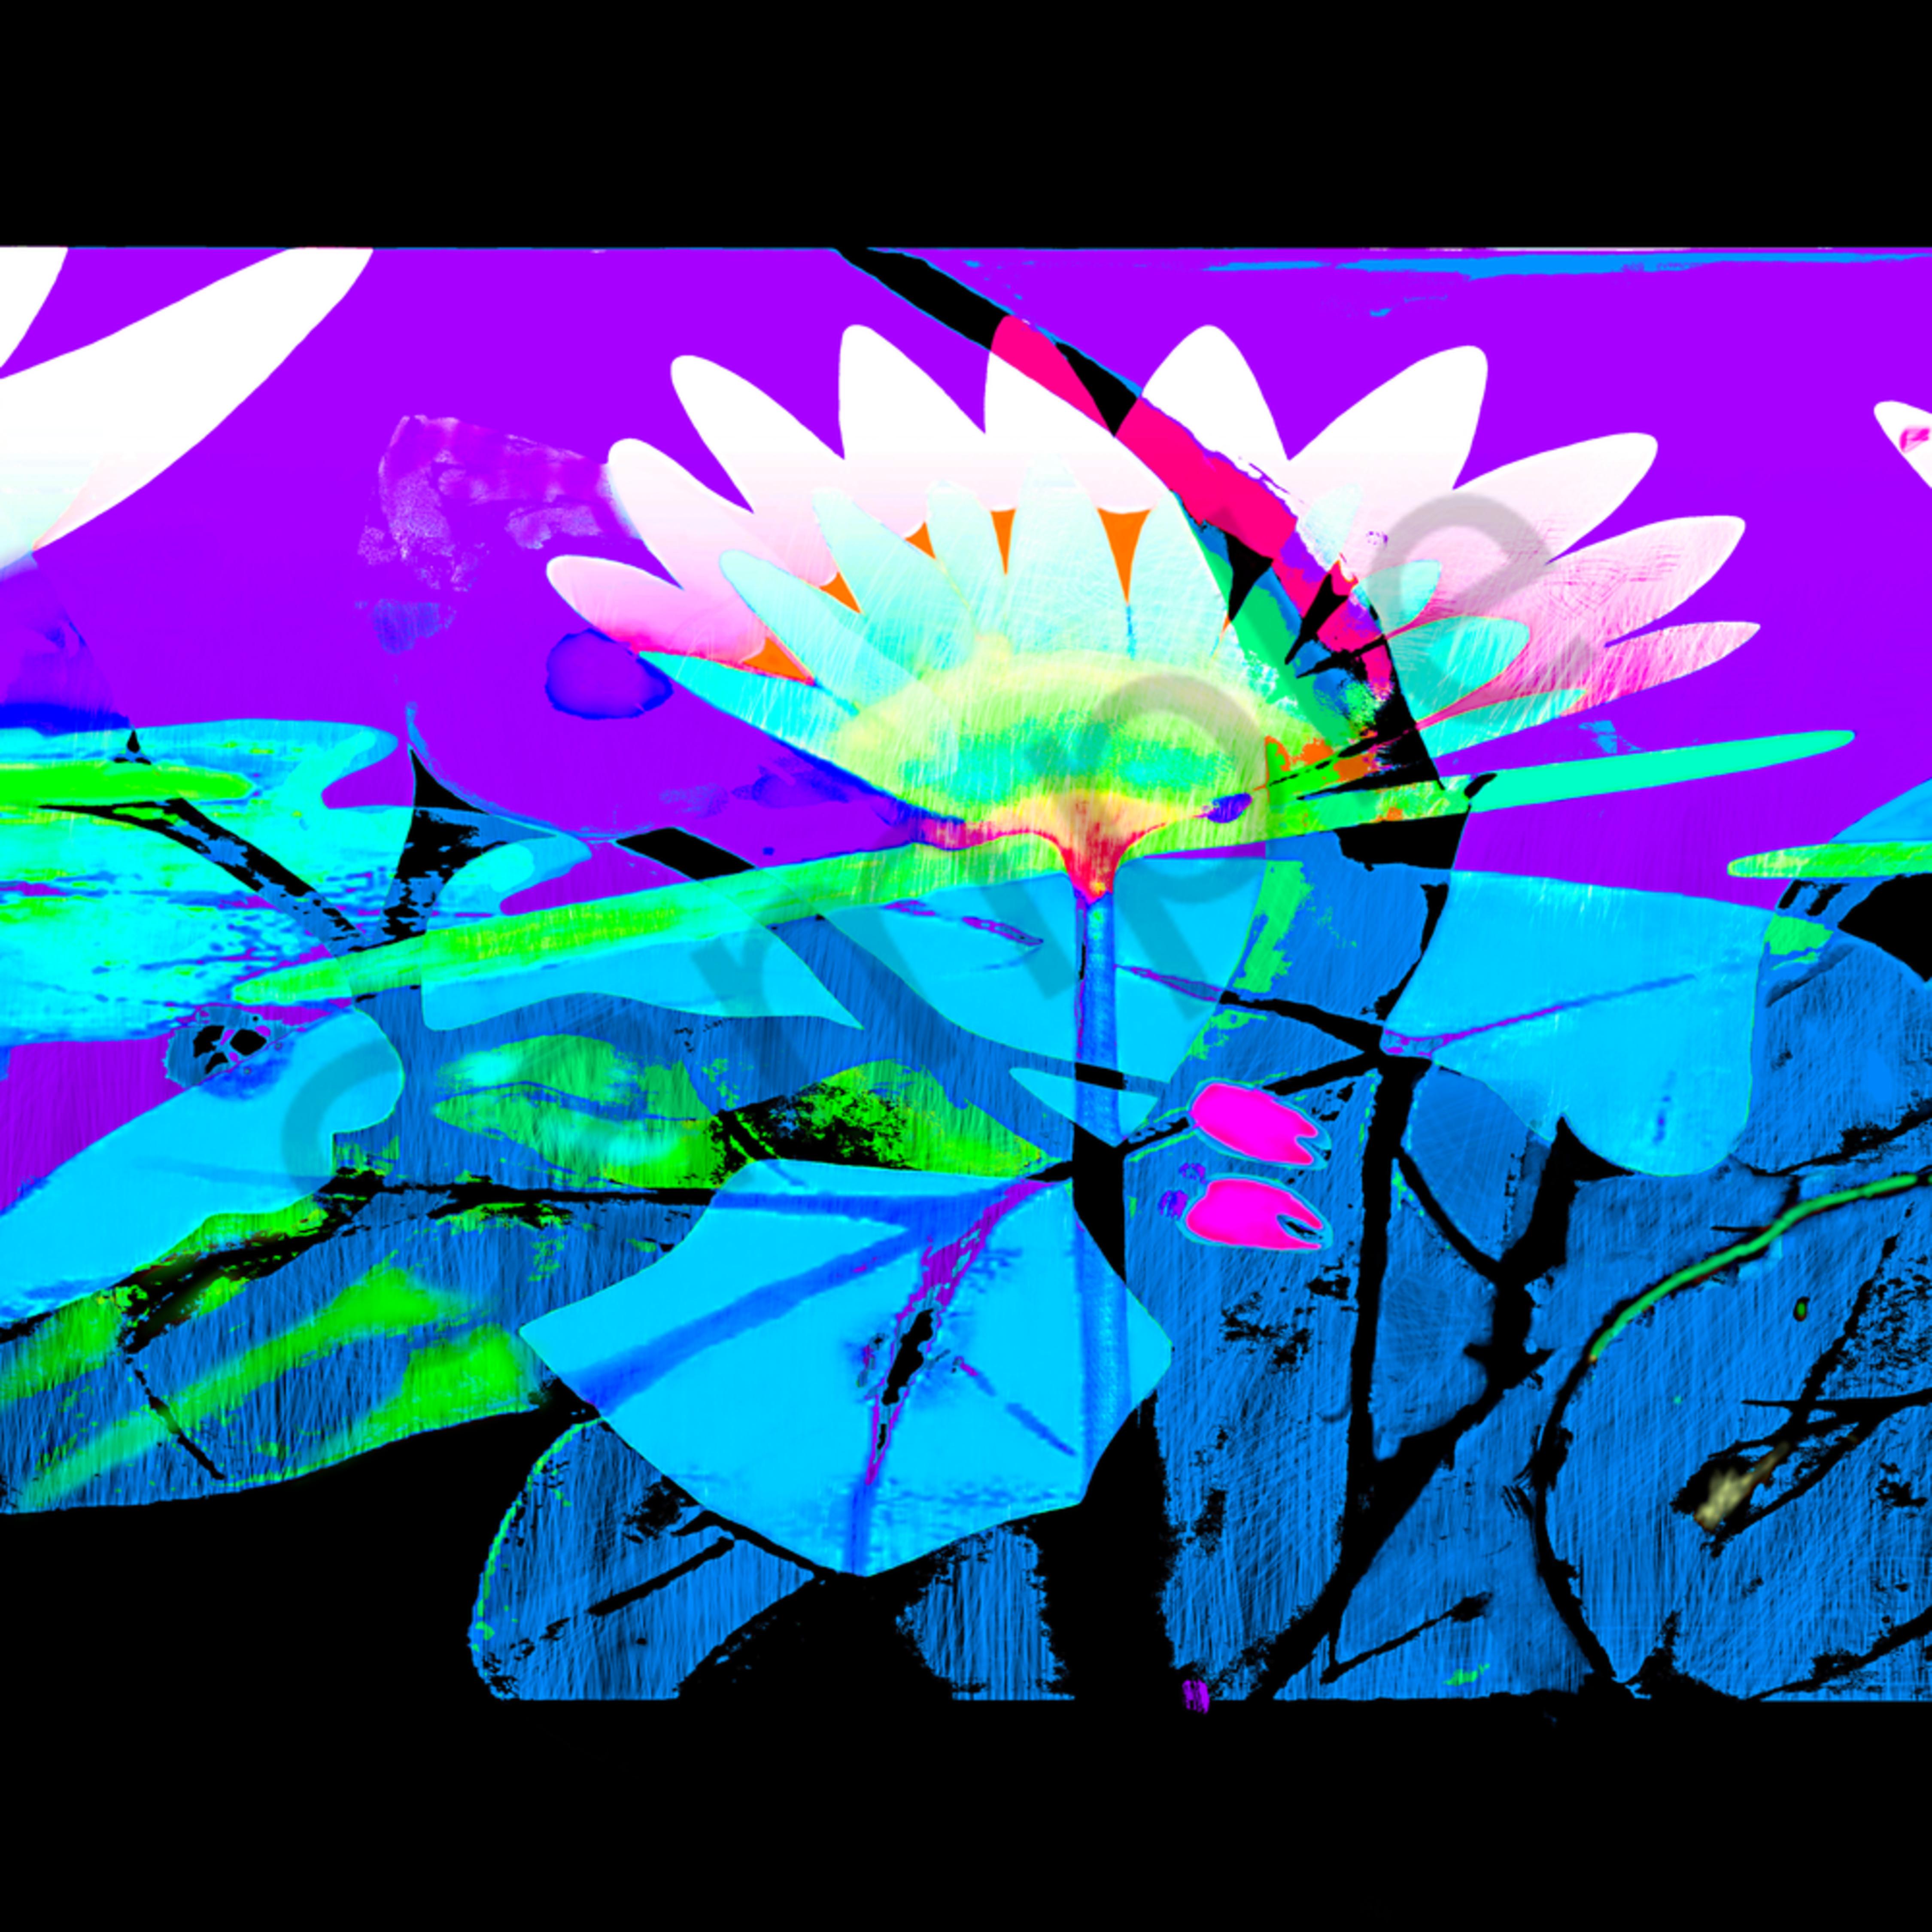 The lillie garden 4 hkzb6w